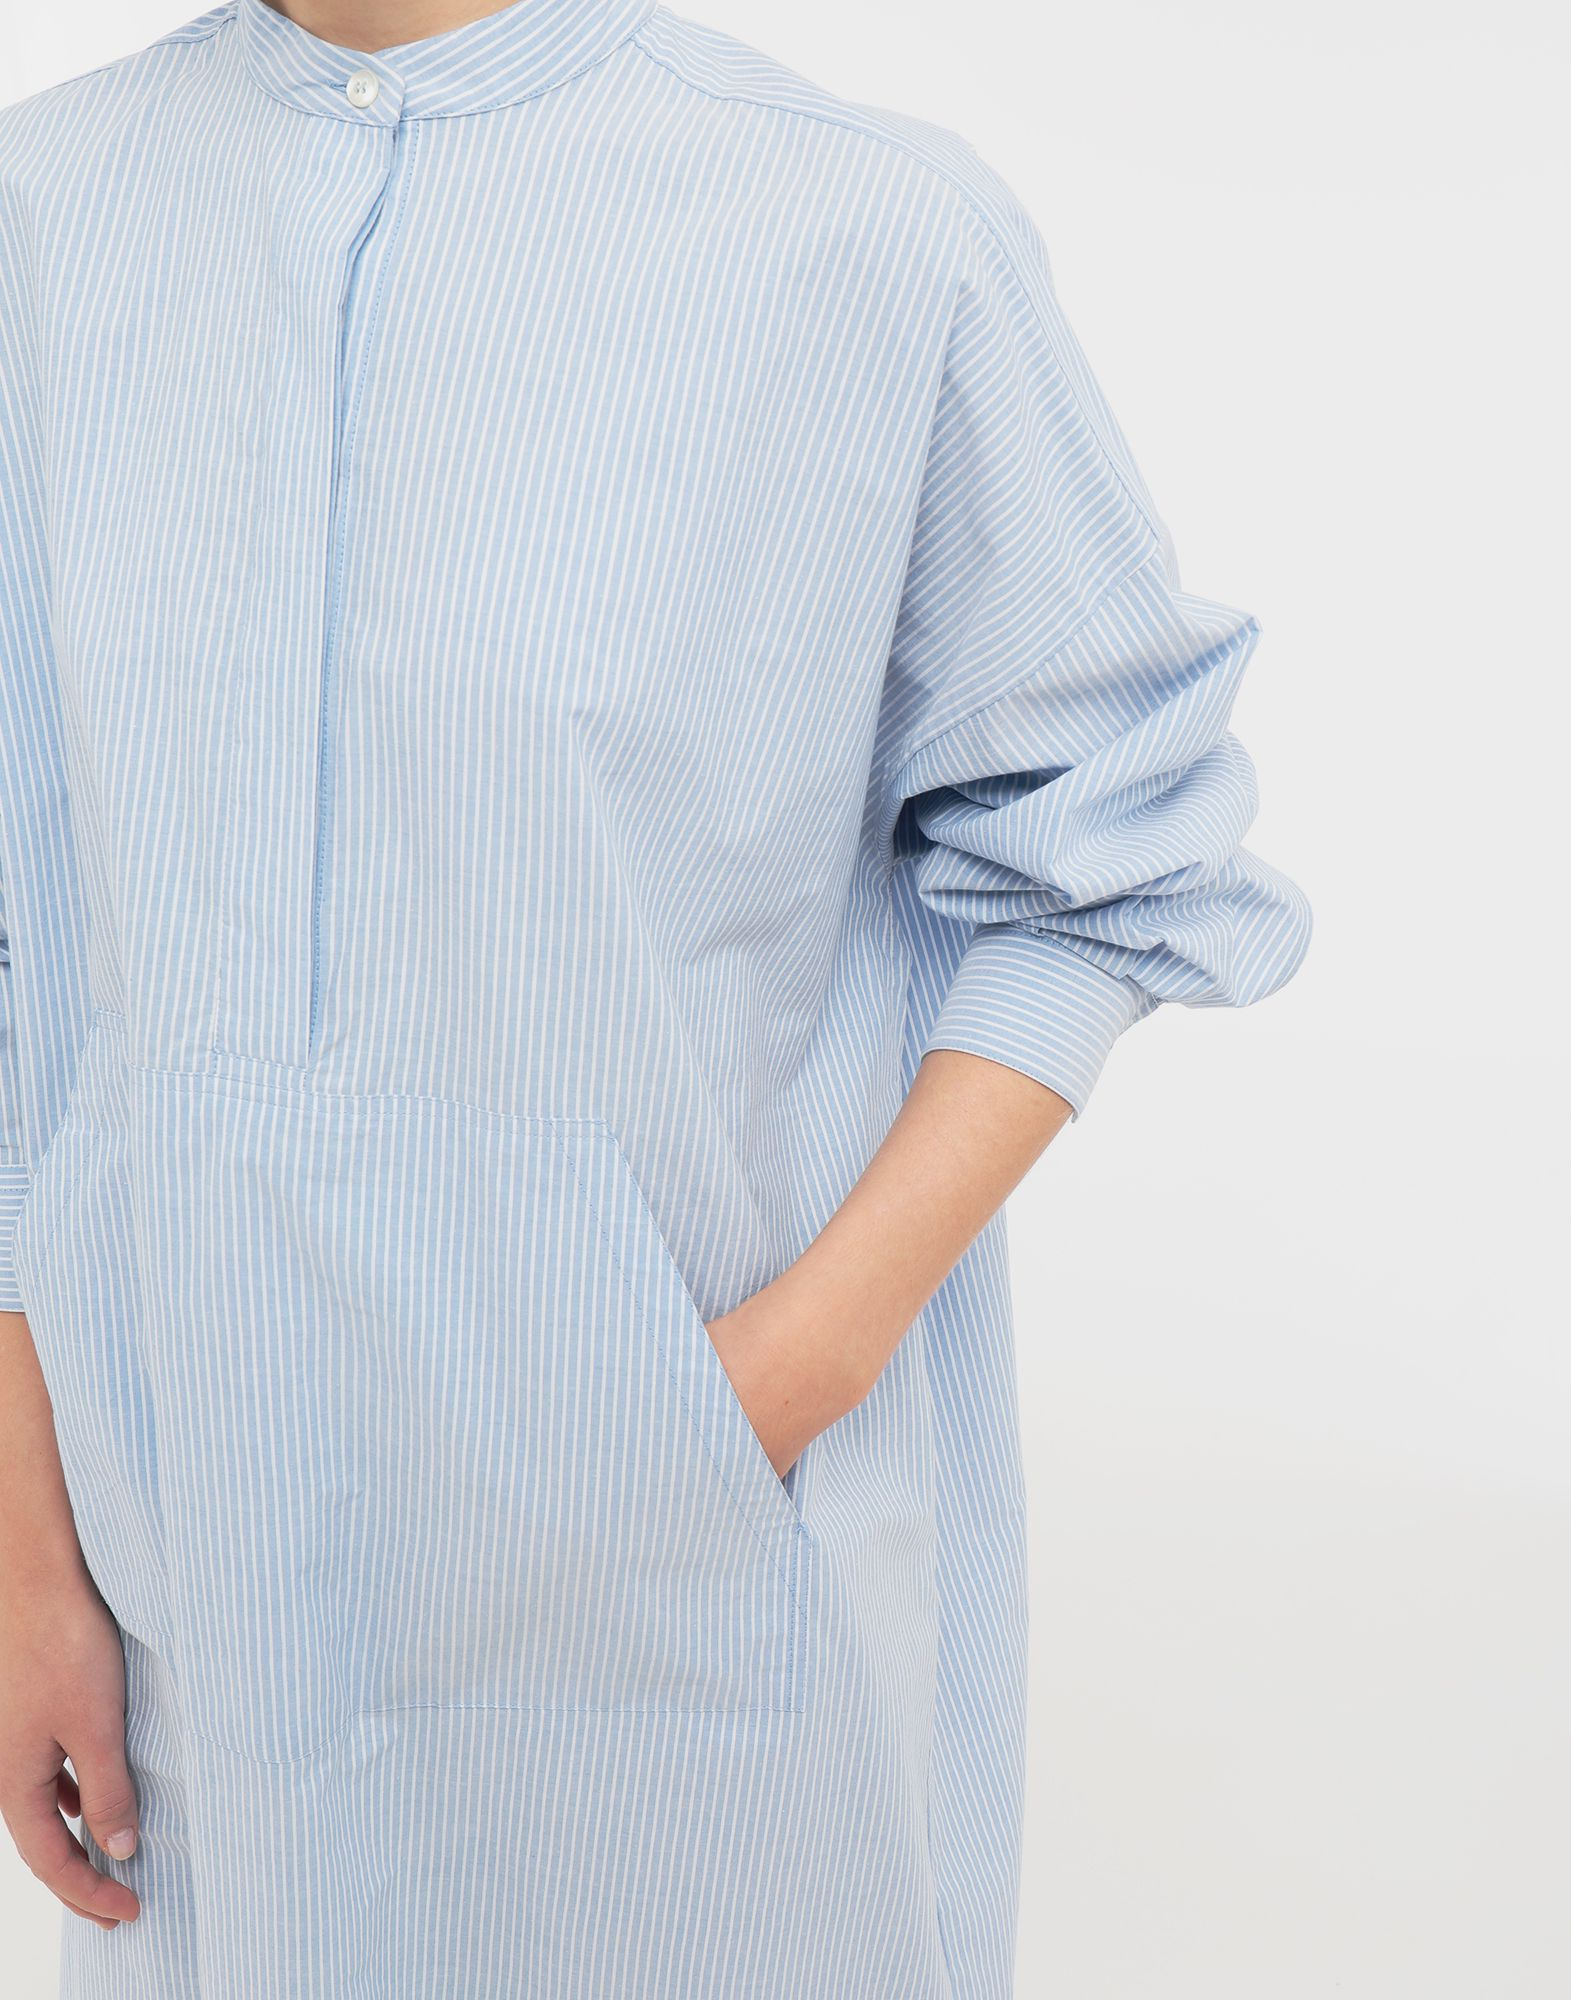 MM6 MAISON MARGIELA Logo-print poplin shirt dress Dress Woman b